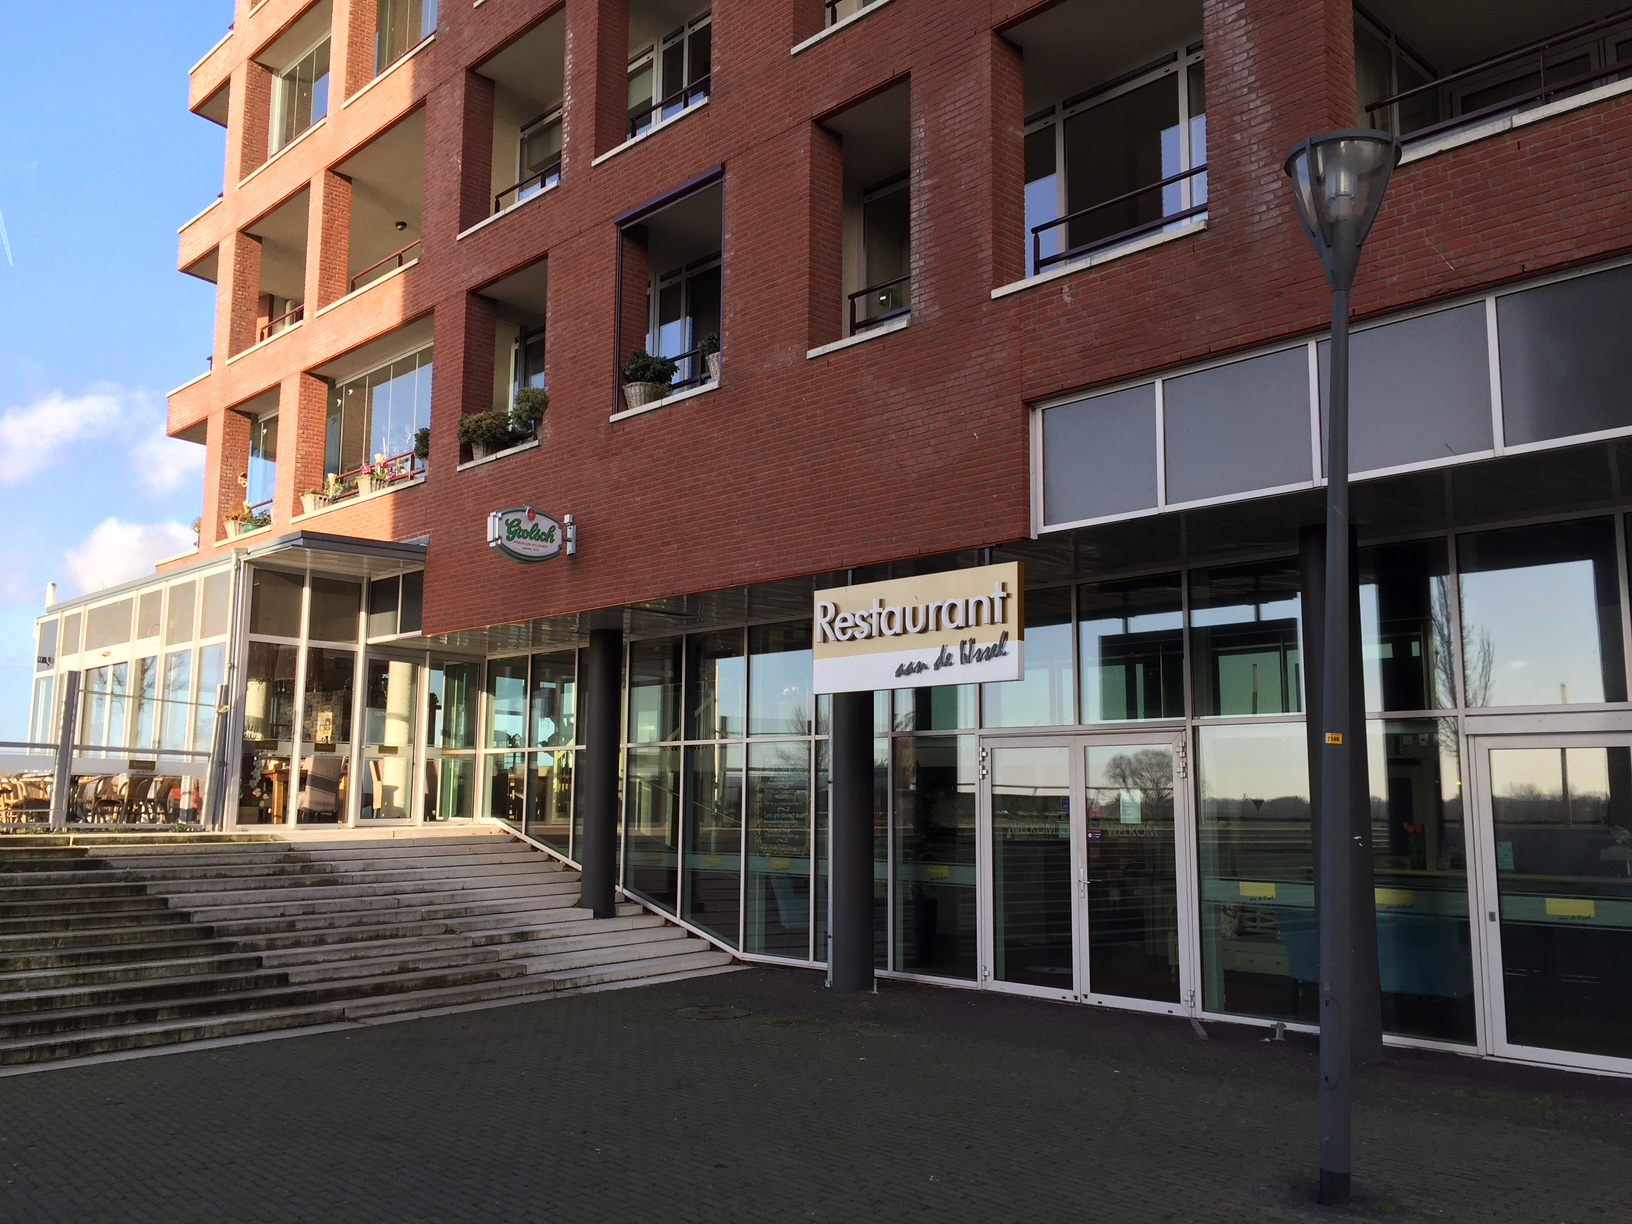 Hotel Doesburg